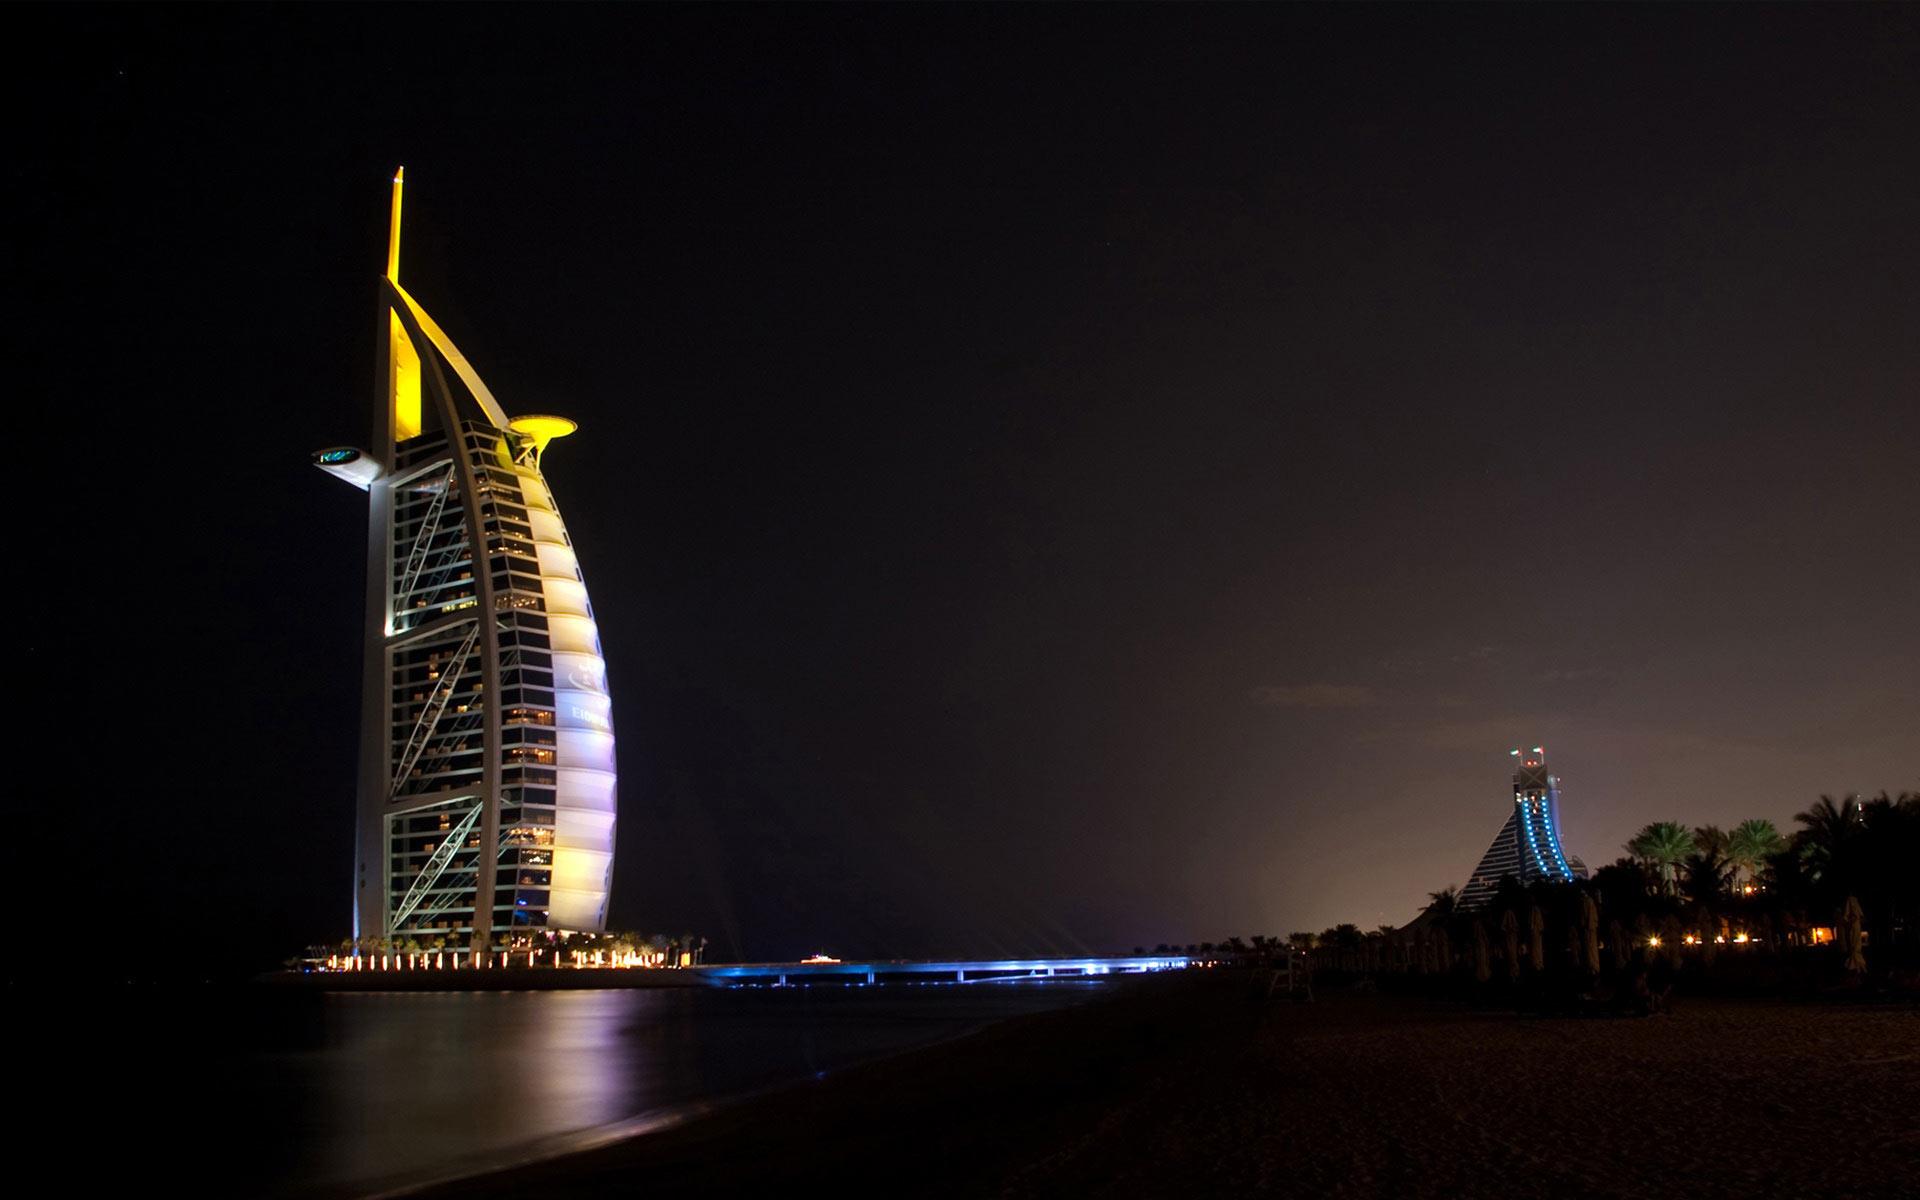 Burj al arab wallpapers pictures images for Burj al khalifa hotel